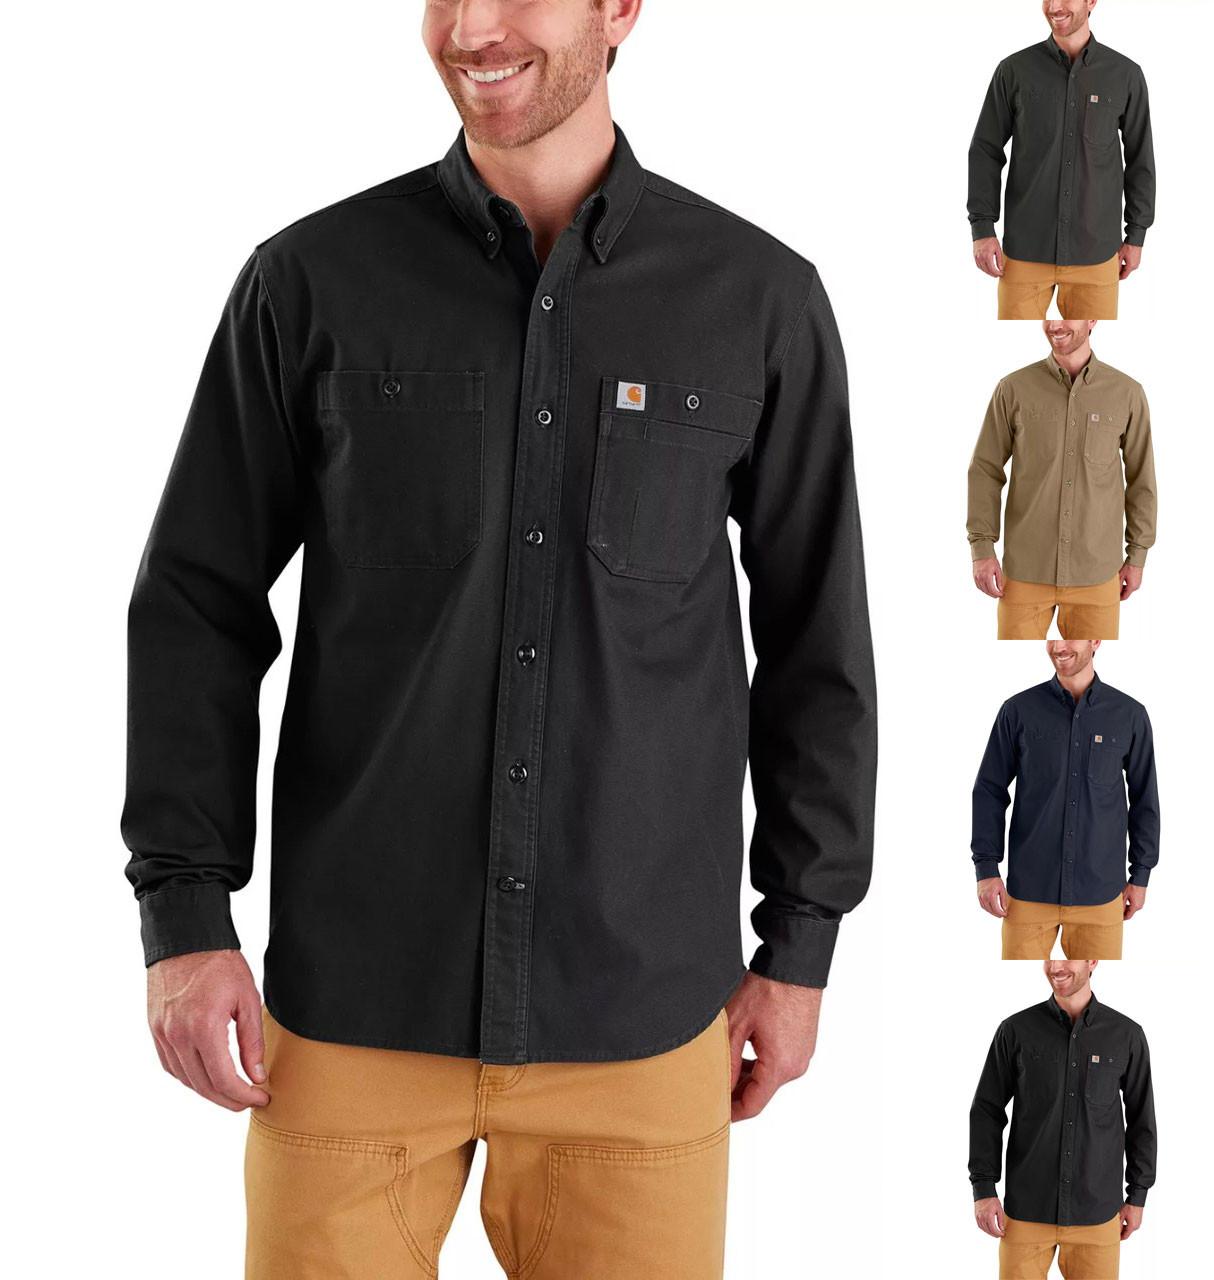 Carhartt Men S Rugged Flex Rigby Long Sleeve Work Shirts Use